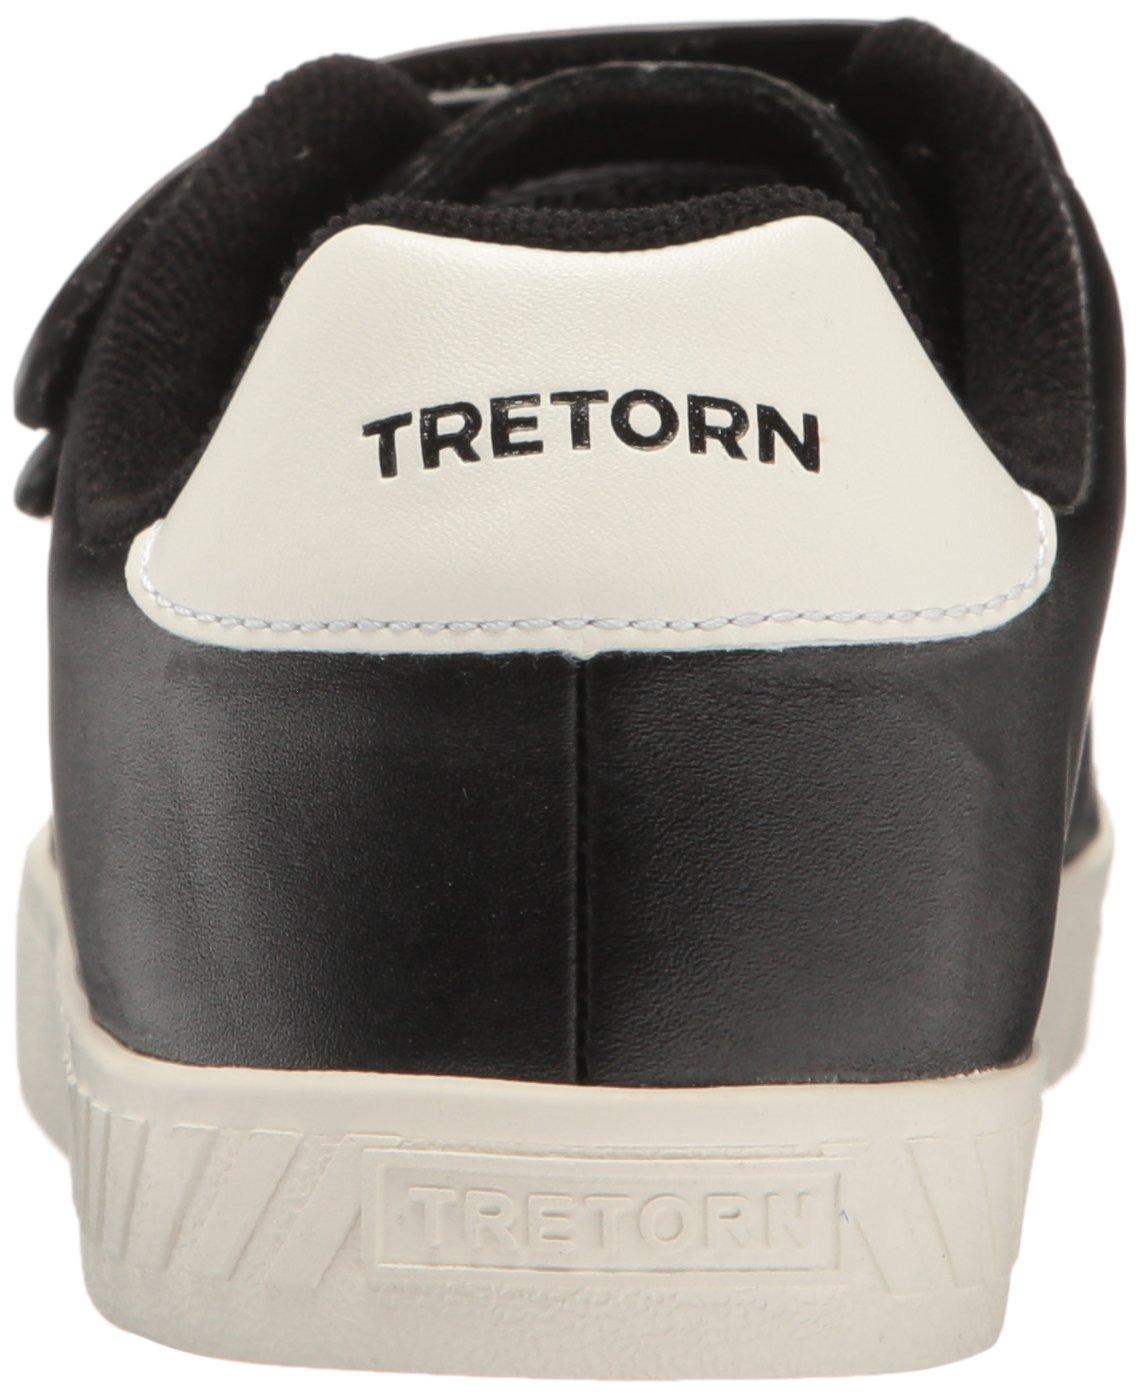 Tretorn Women's CARRY2 Sneaker B01N0RRI0M 5.5 B(M) US|Black